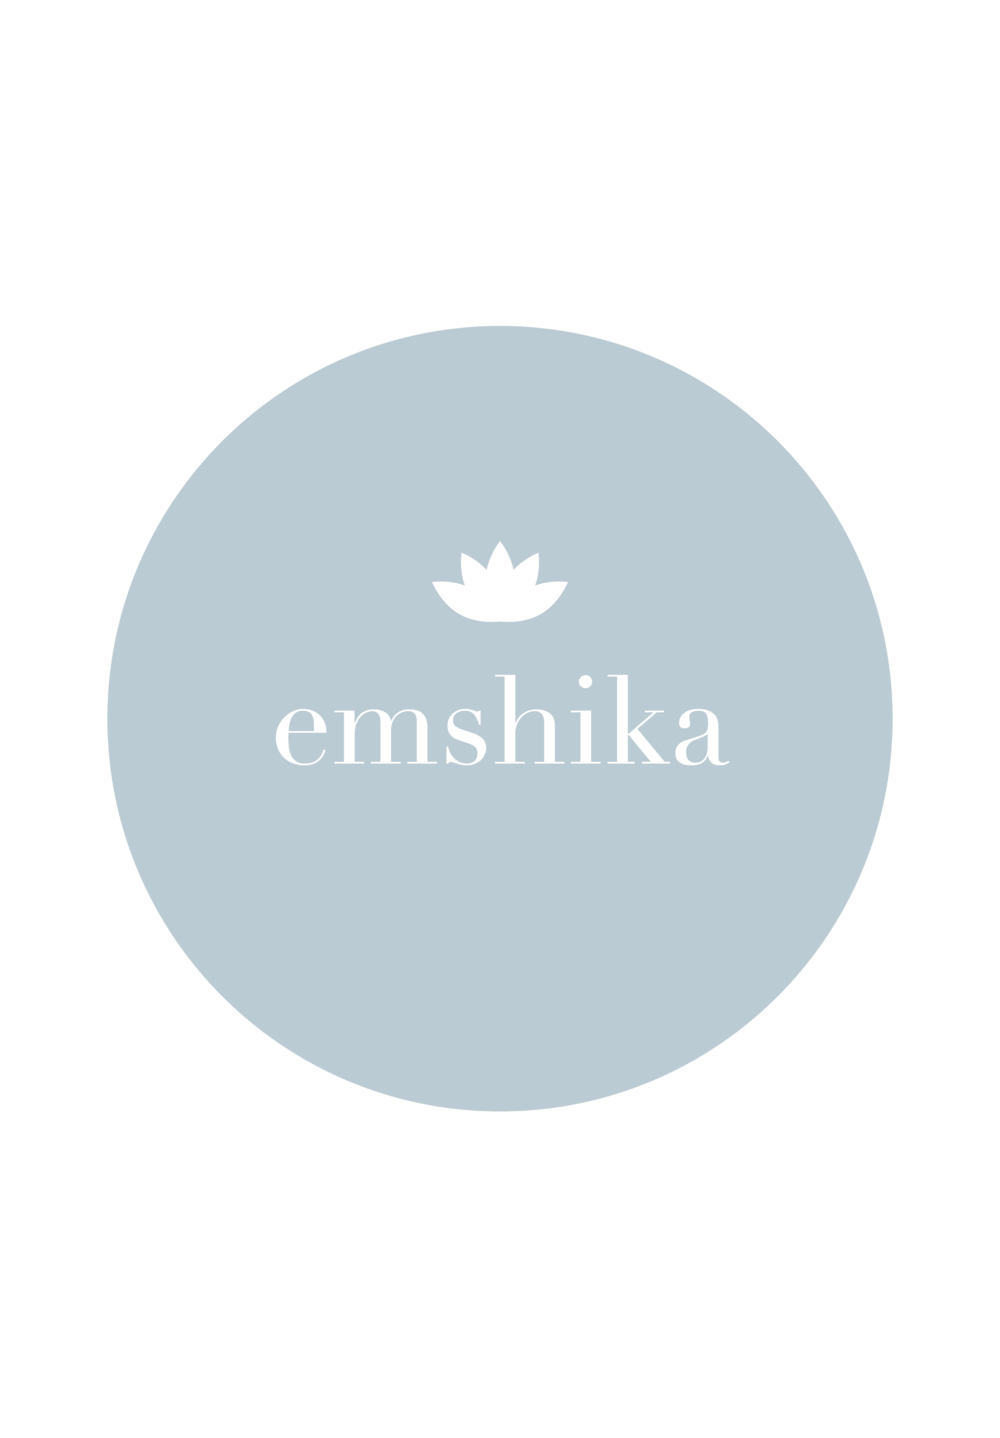 Emshika-Final-Artwork-01.png